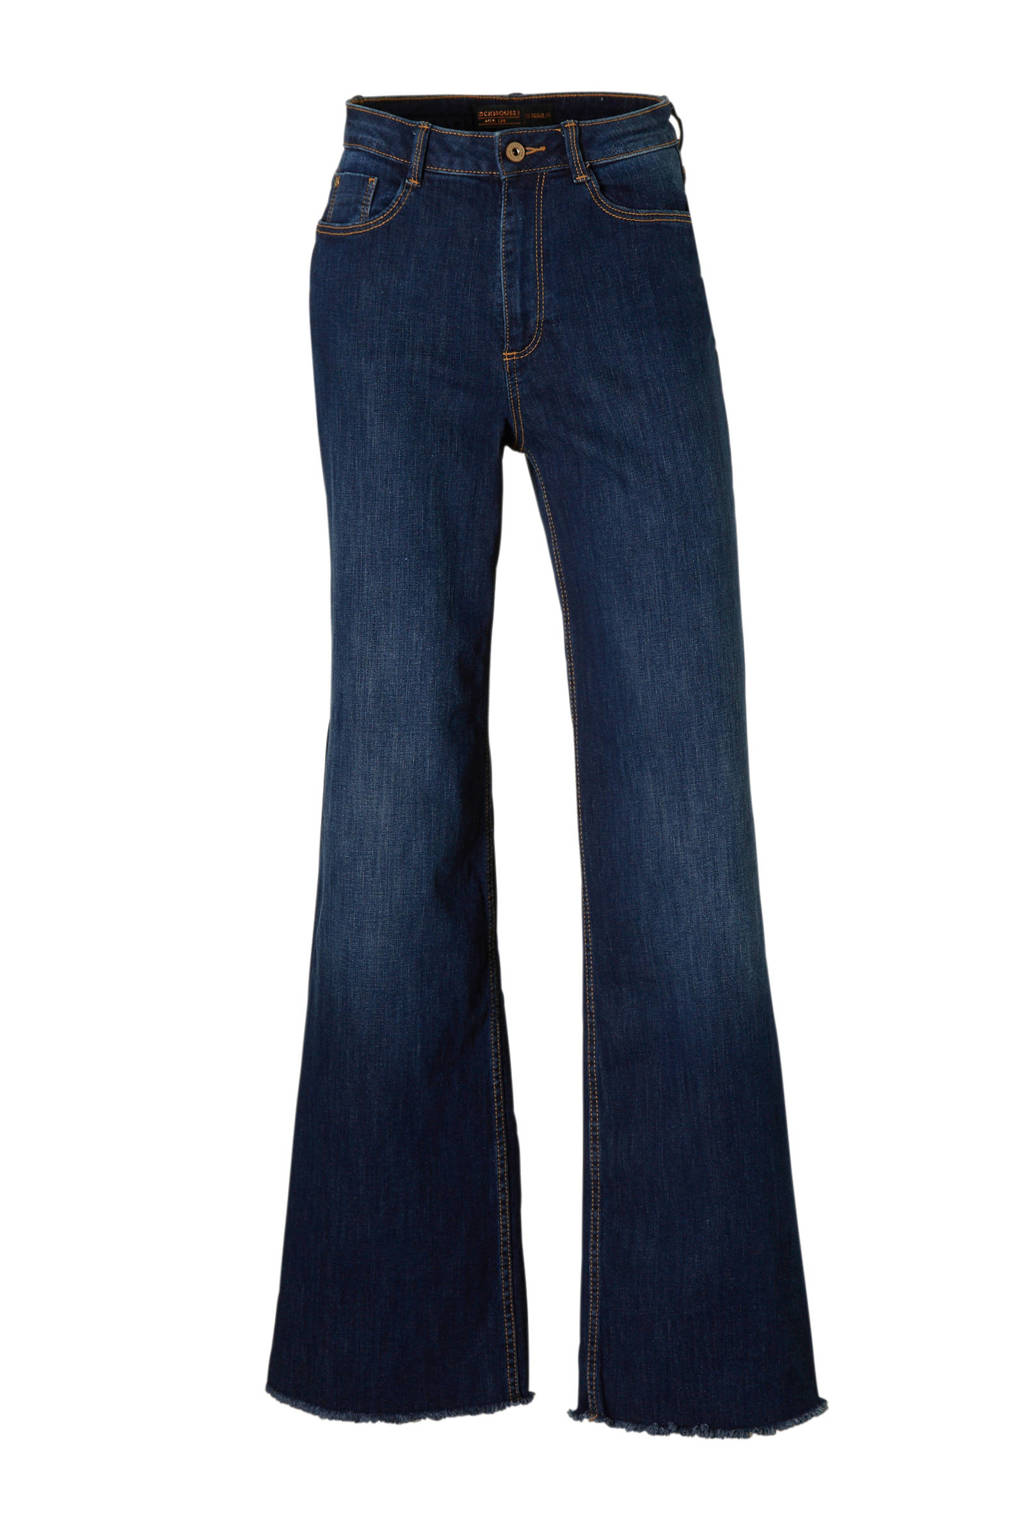 C&A Clockhouse high waist palazzo jeans, Dark denim